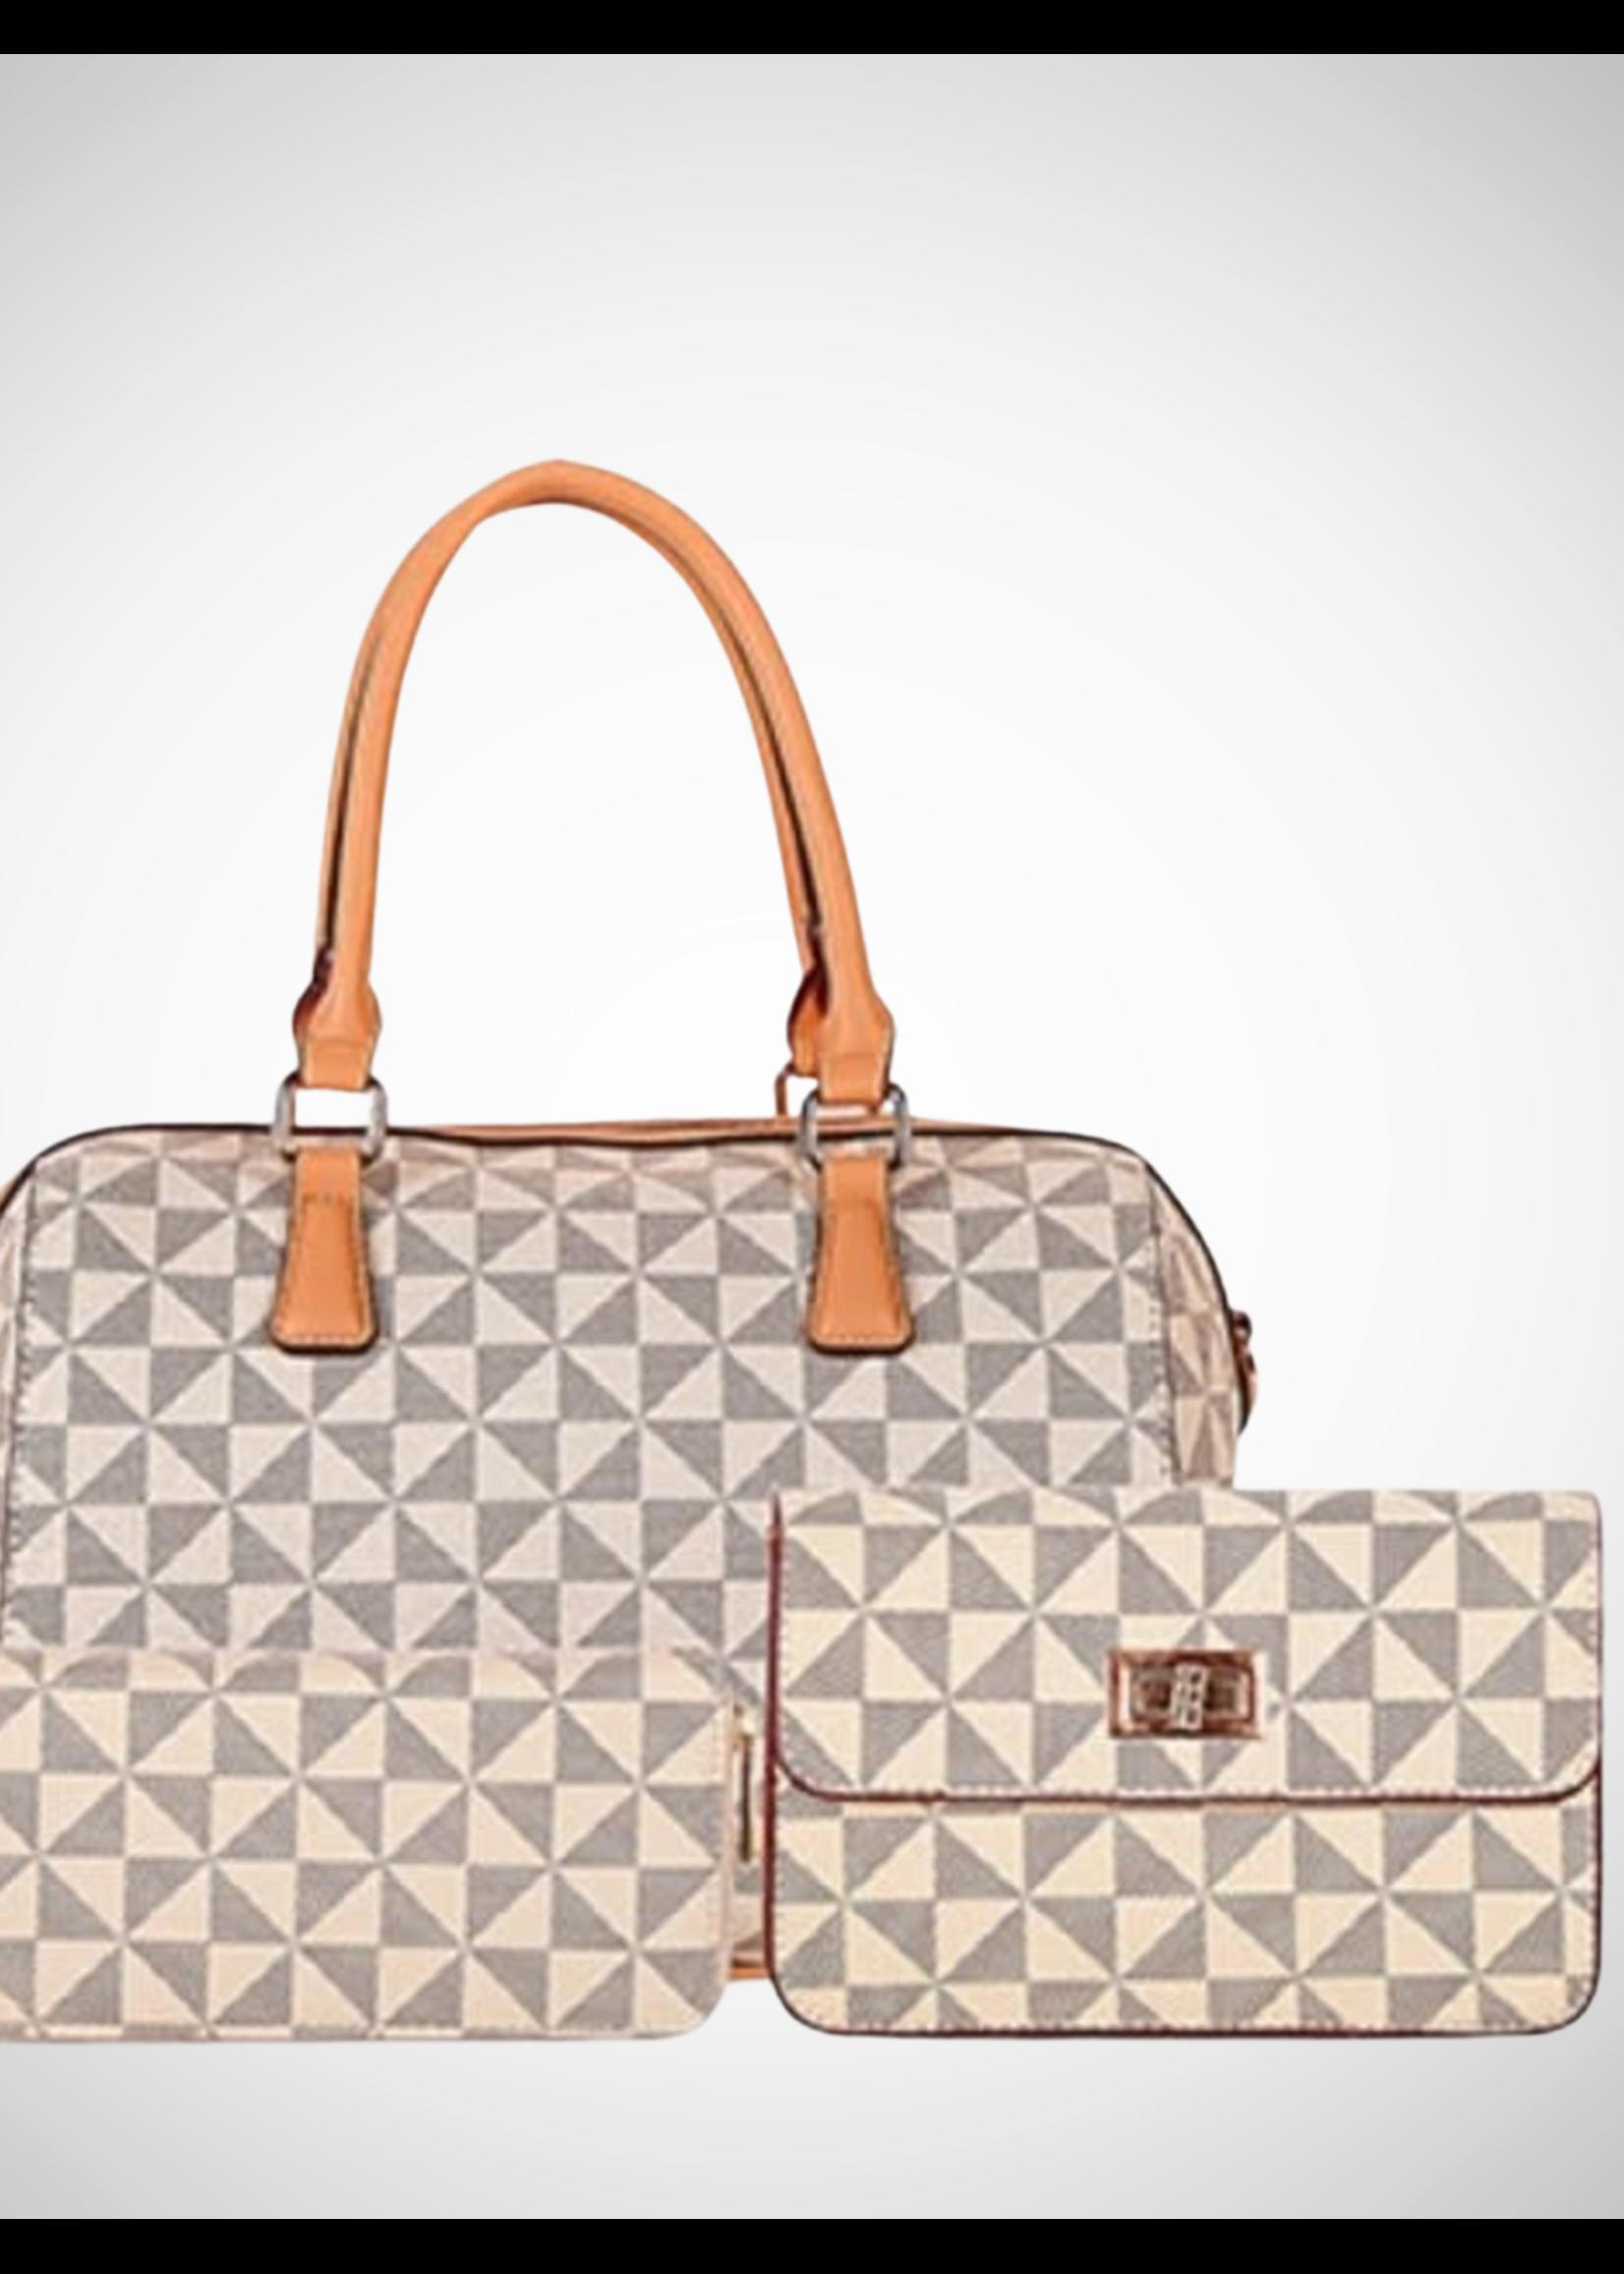 Trendy Print Satchel Handbag 3pc Set